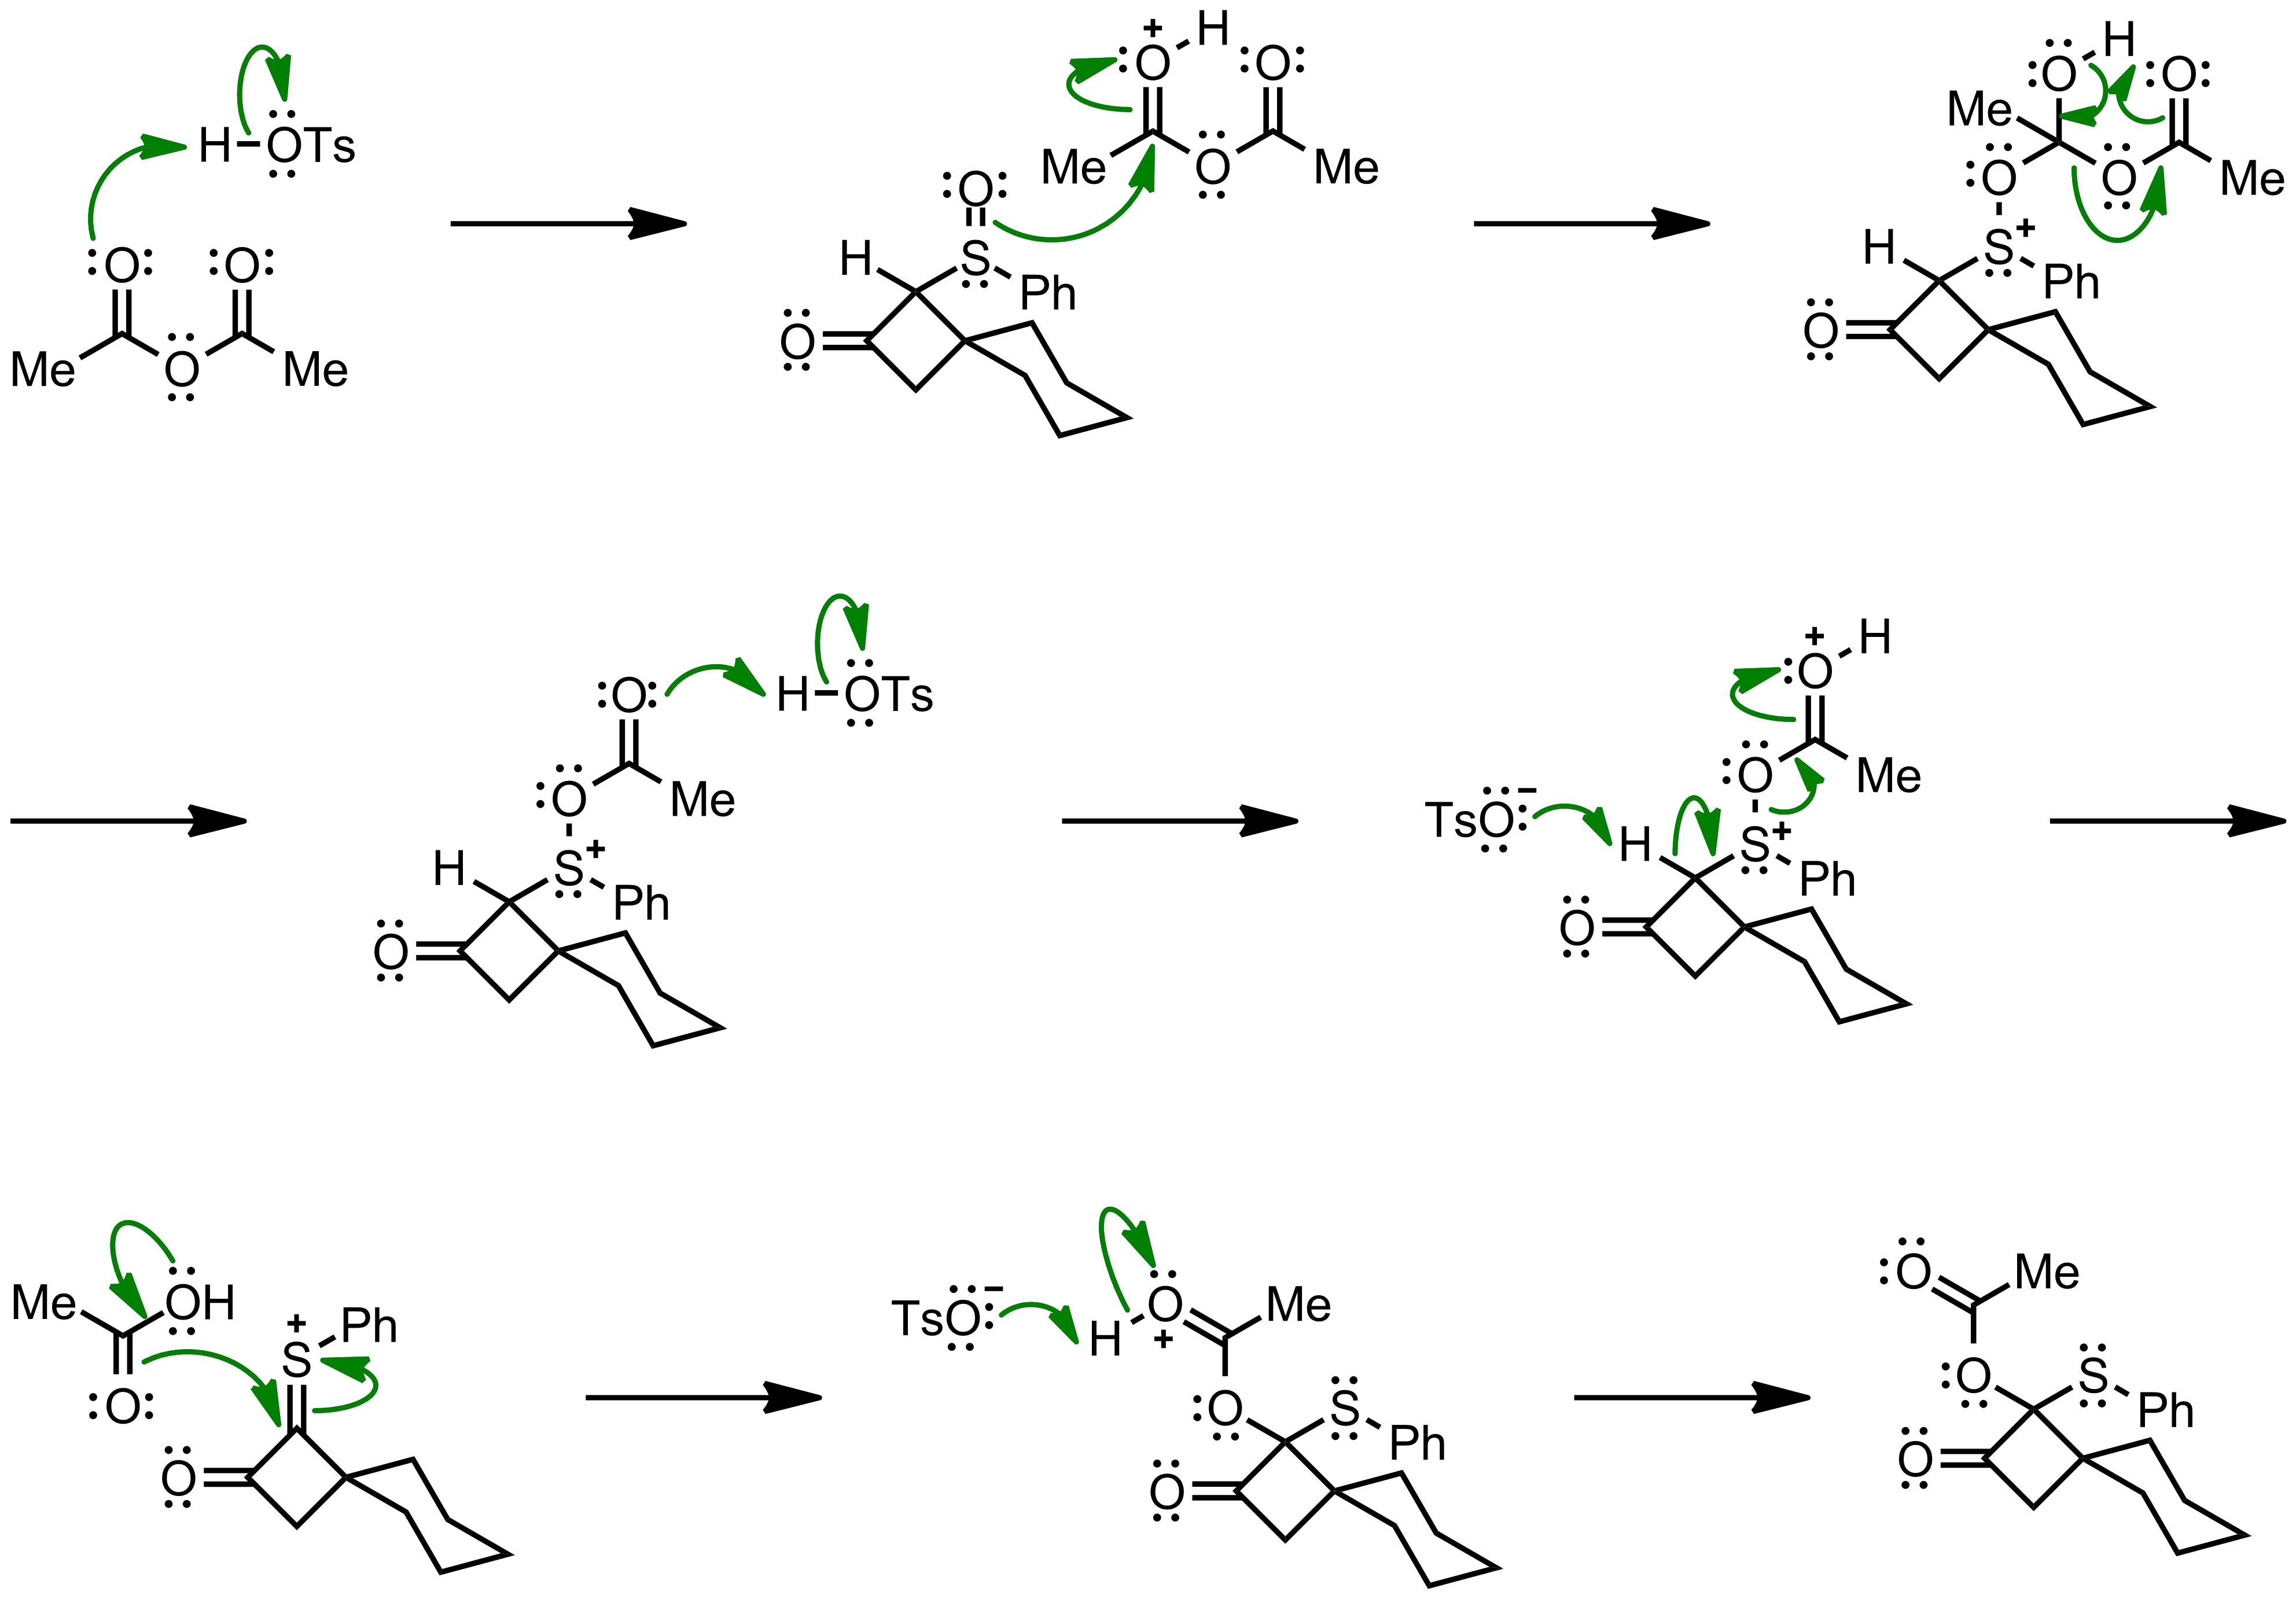 Mechanism of the Pummerer Rearrangement